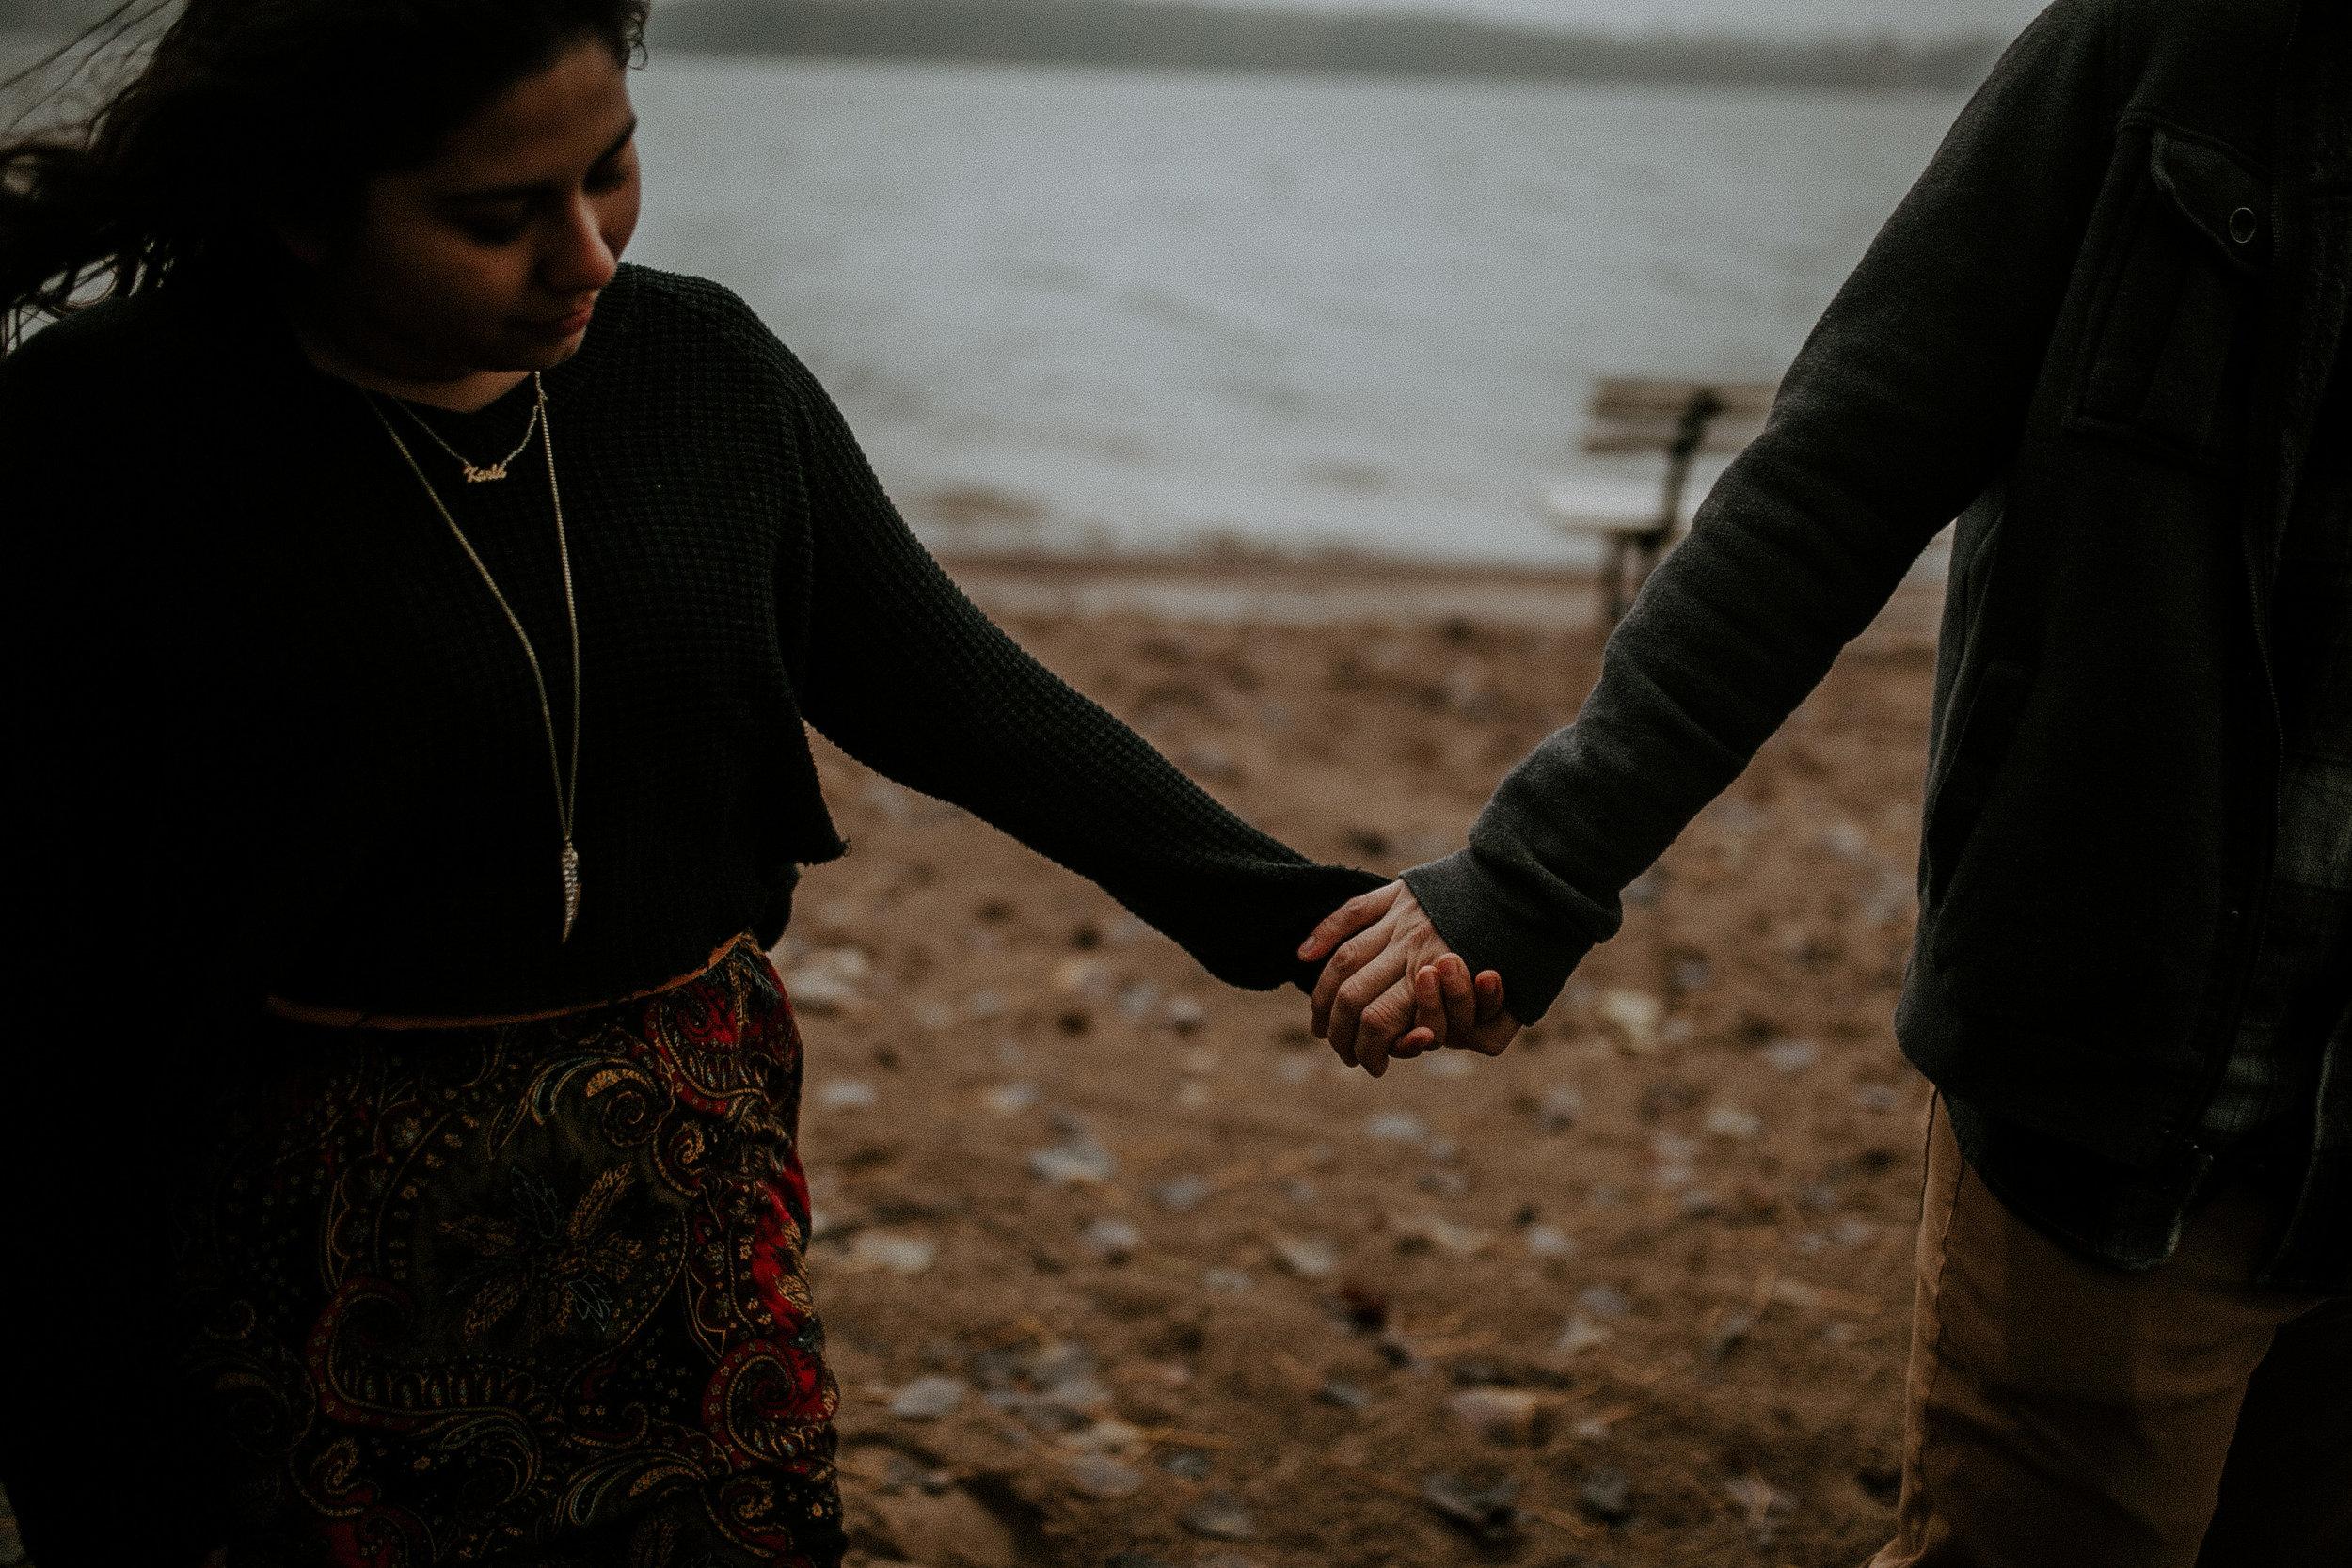 STEPH+DAN-COUPLE-REAGANLYNNPHOTOGRAPHY-PRAIRIECREEKRESERVOIR-MUNCIE-INDIANA-20.jpg